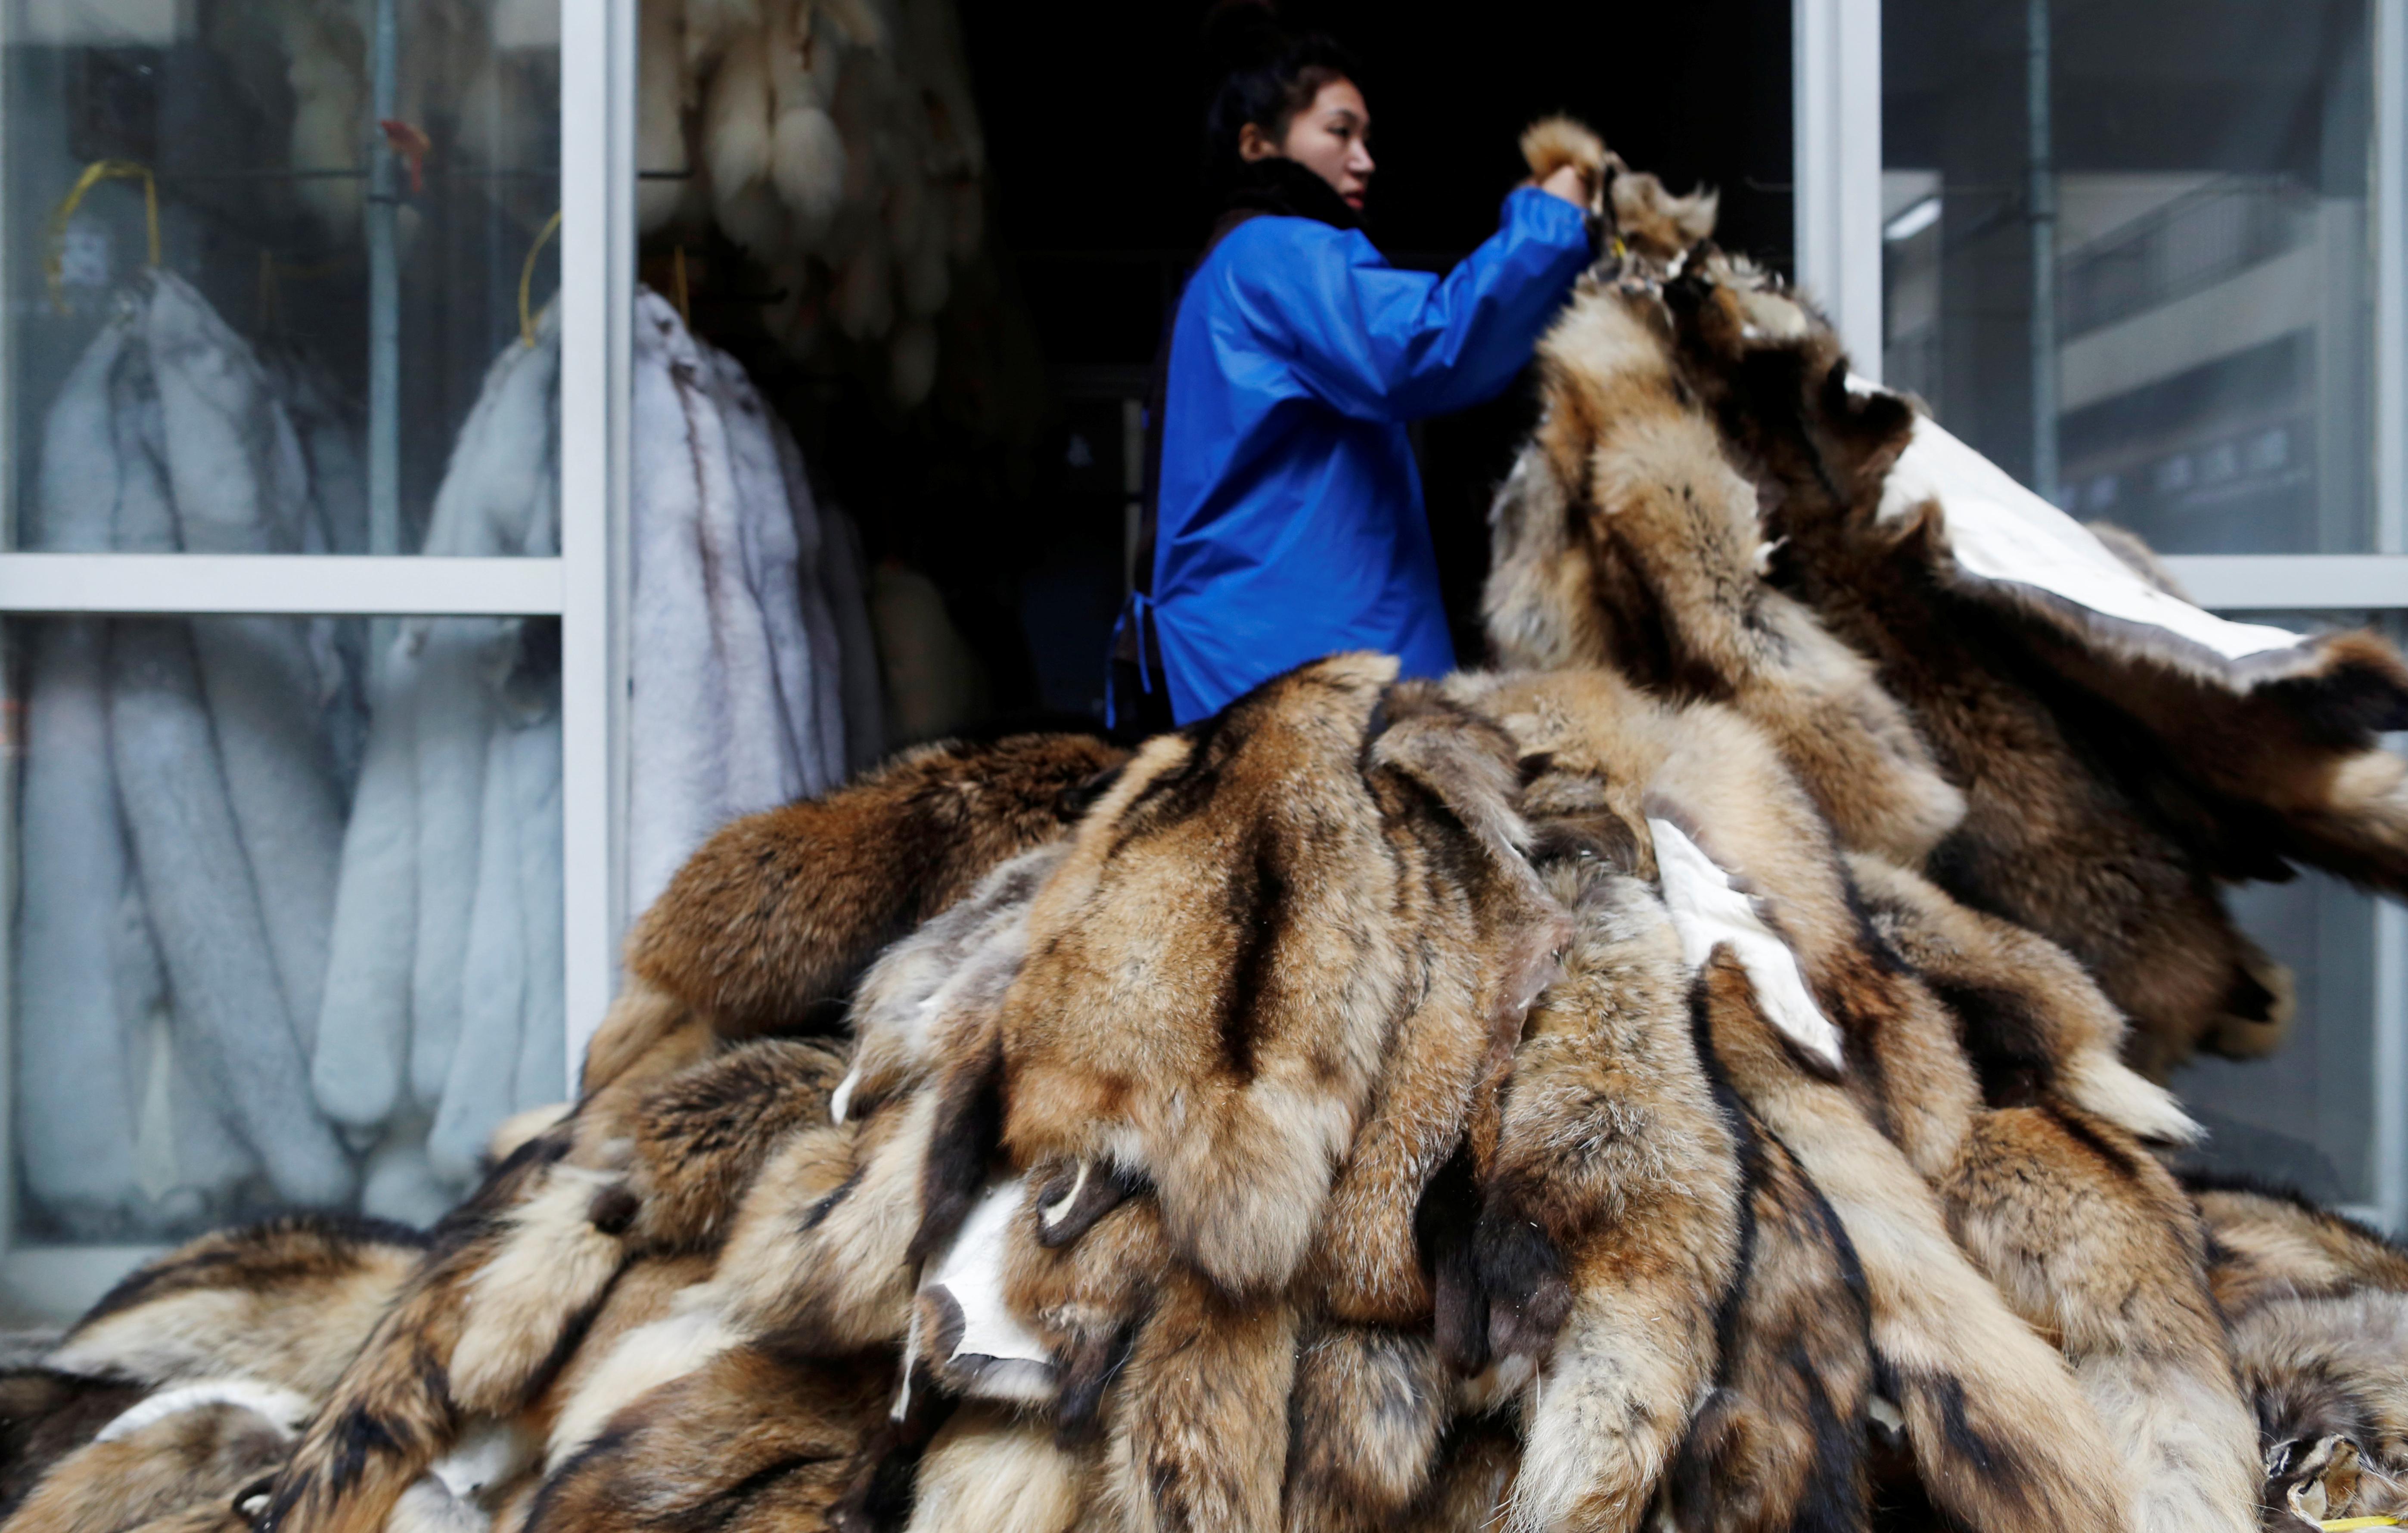 A woman moves raccoon fur pelts outdoor at a fur market in Chongfu, Zhejiang province, China December 14, 2017. REUTERS/William Hong.